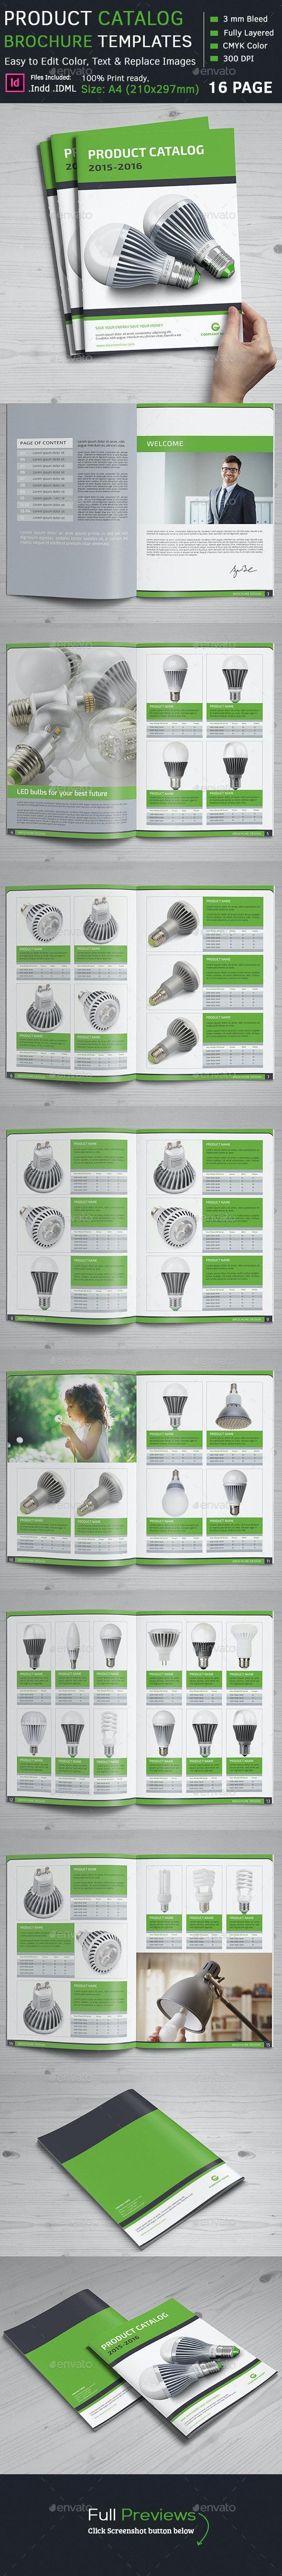 Product Catalog - Catalogs Brochures